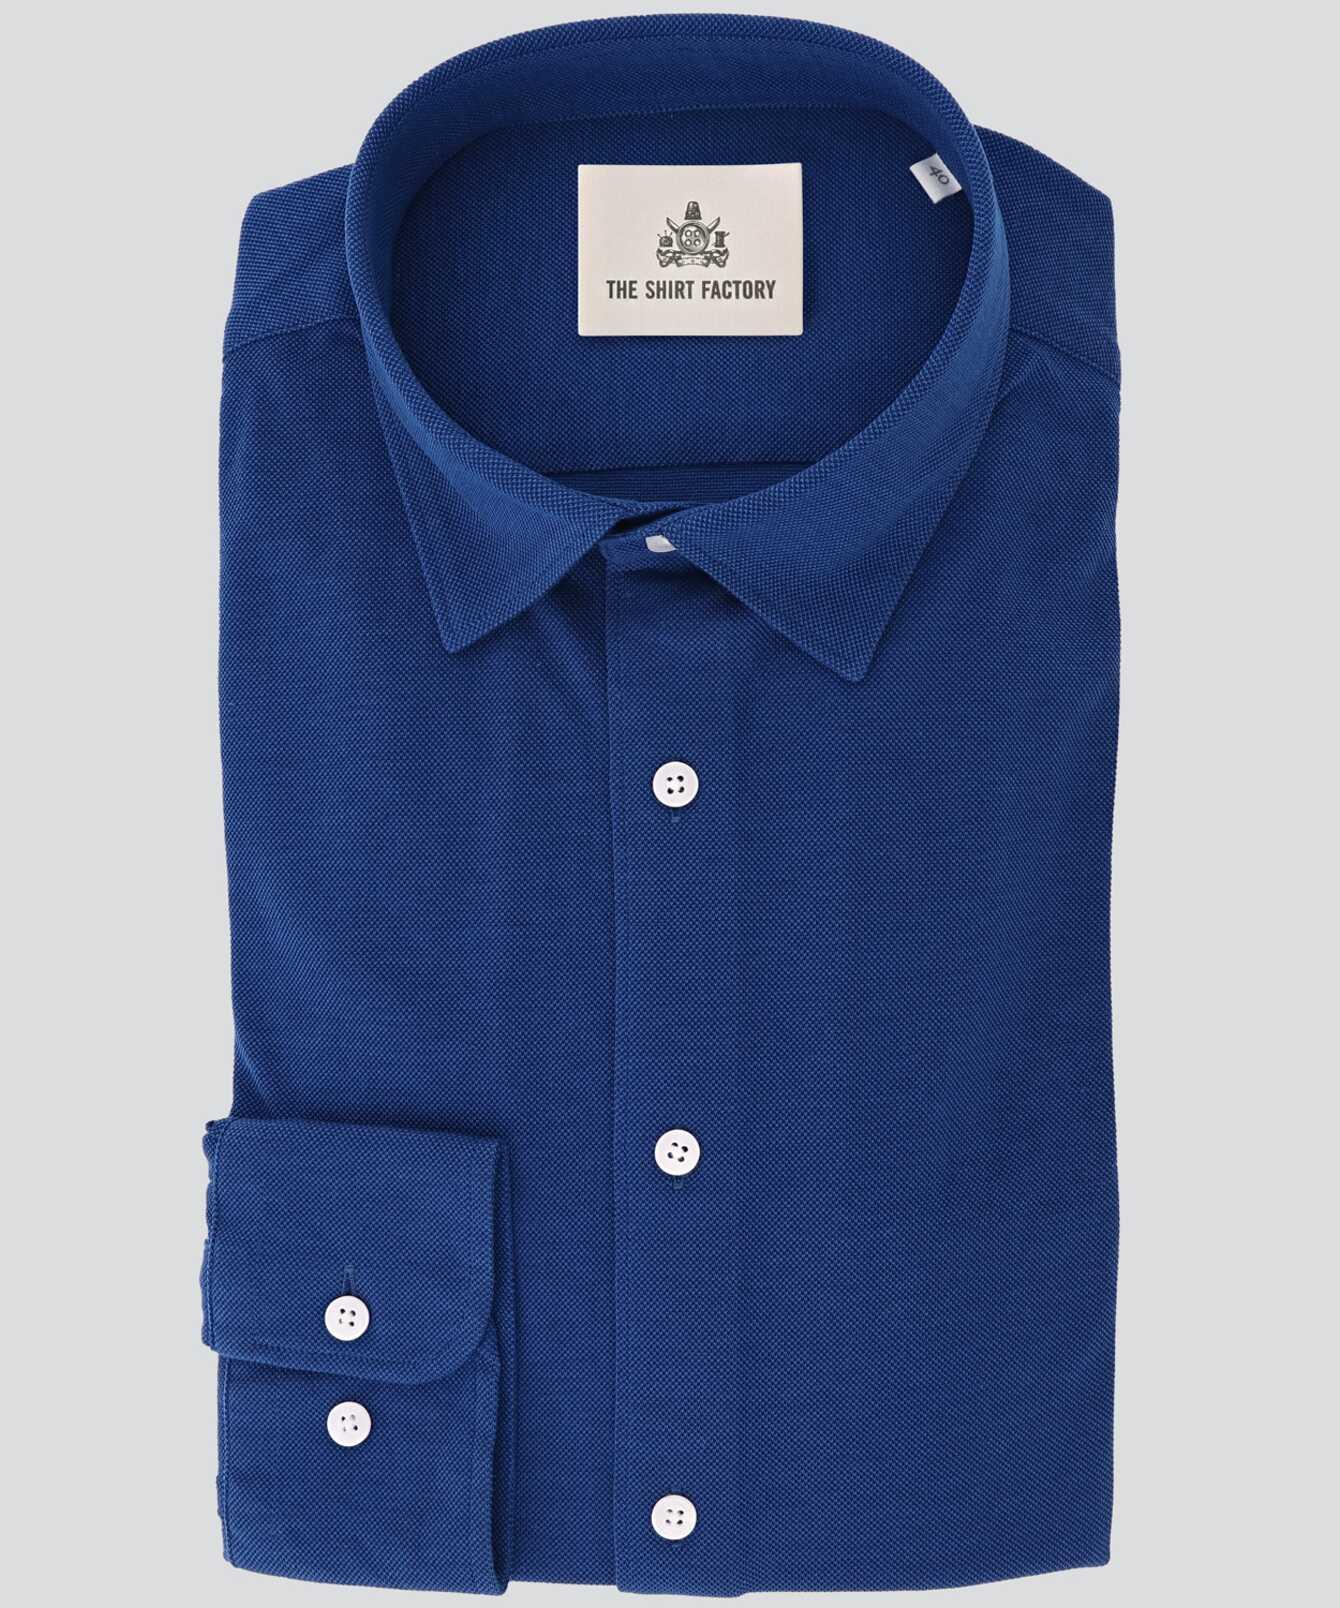 Shirt Royal Troon Pique Blue The Shirt Factory